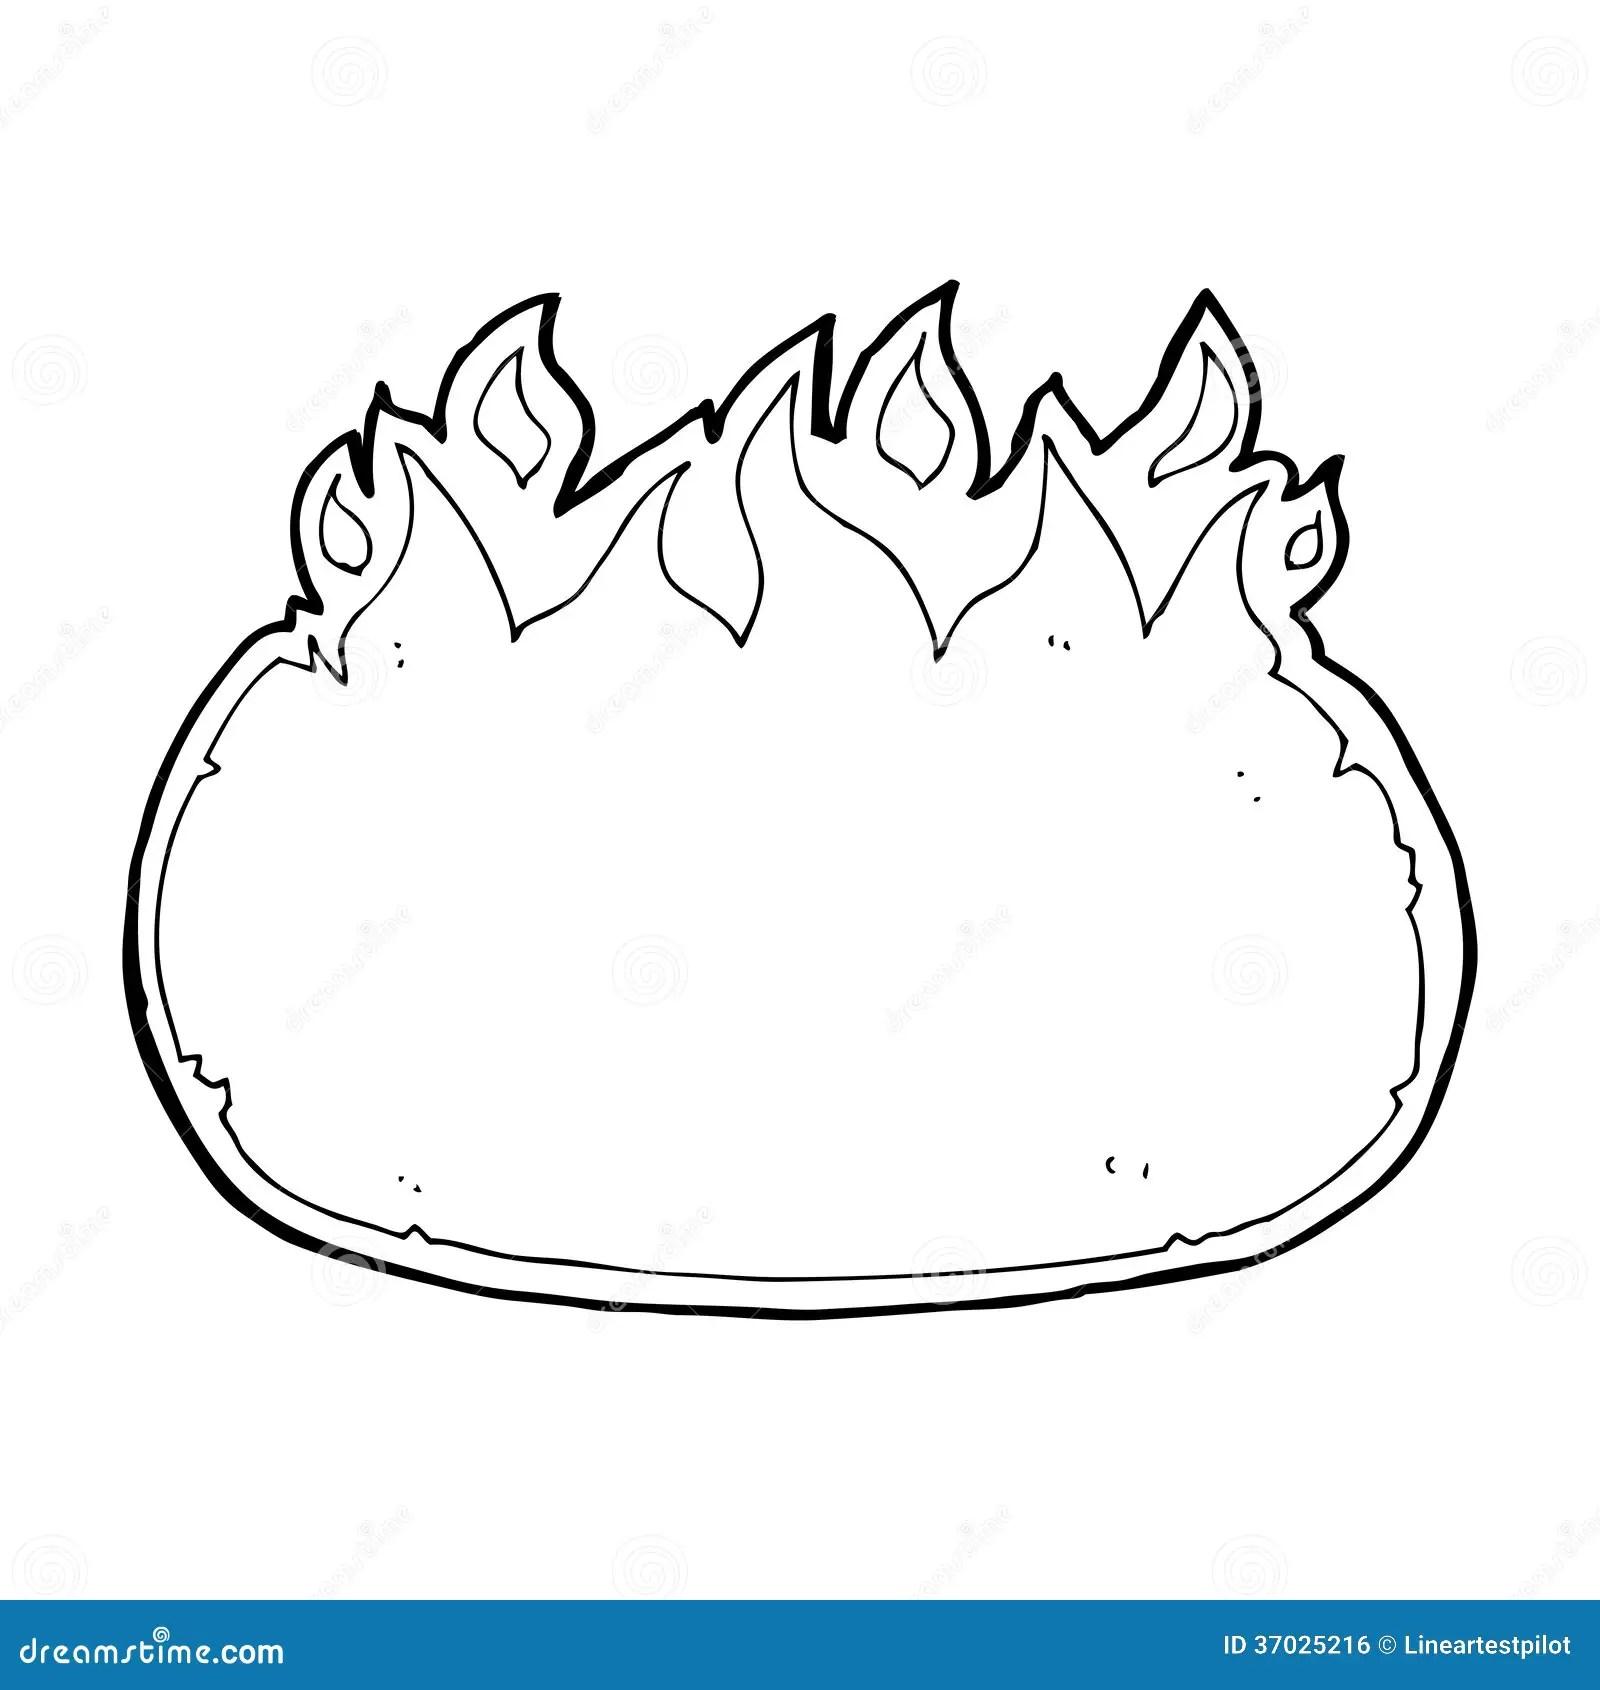 Cartoon Fire Border Royalty Free Stock Image